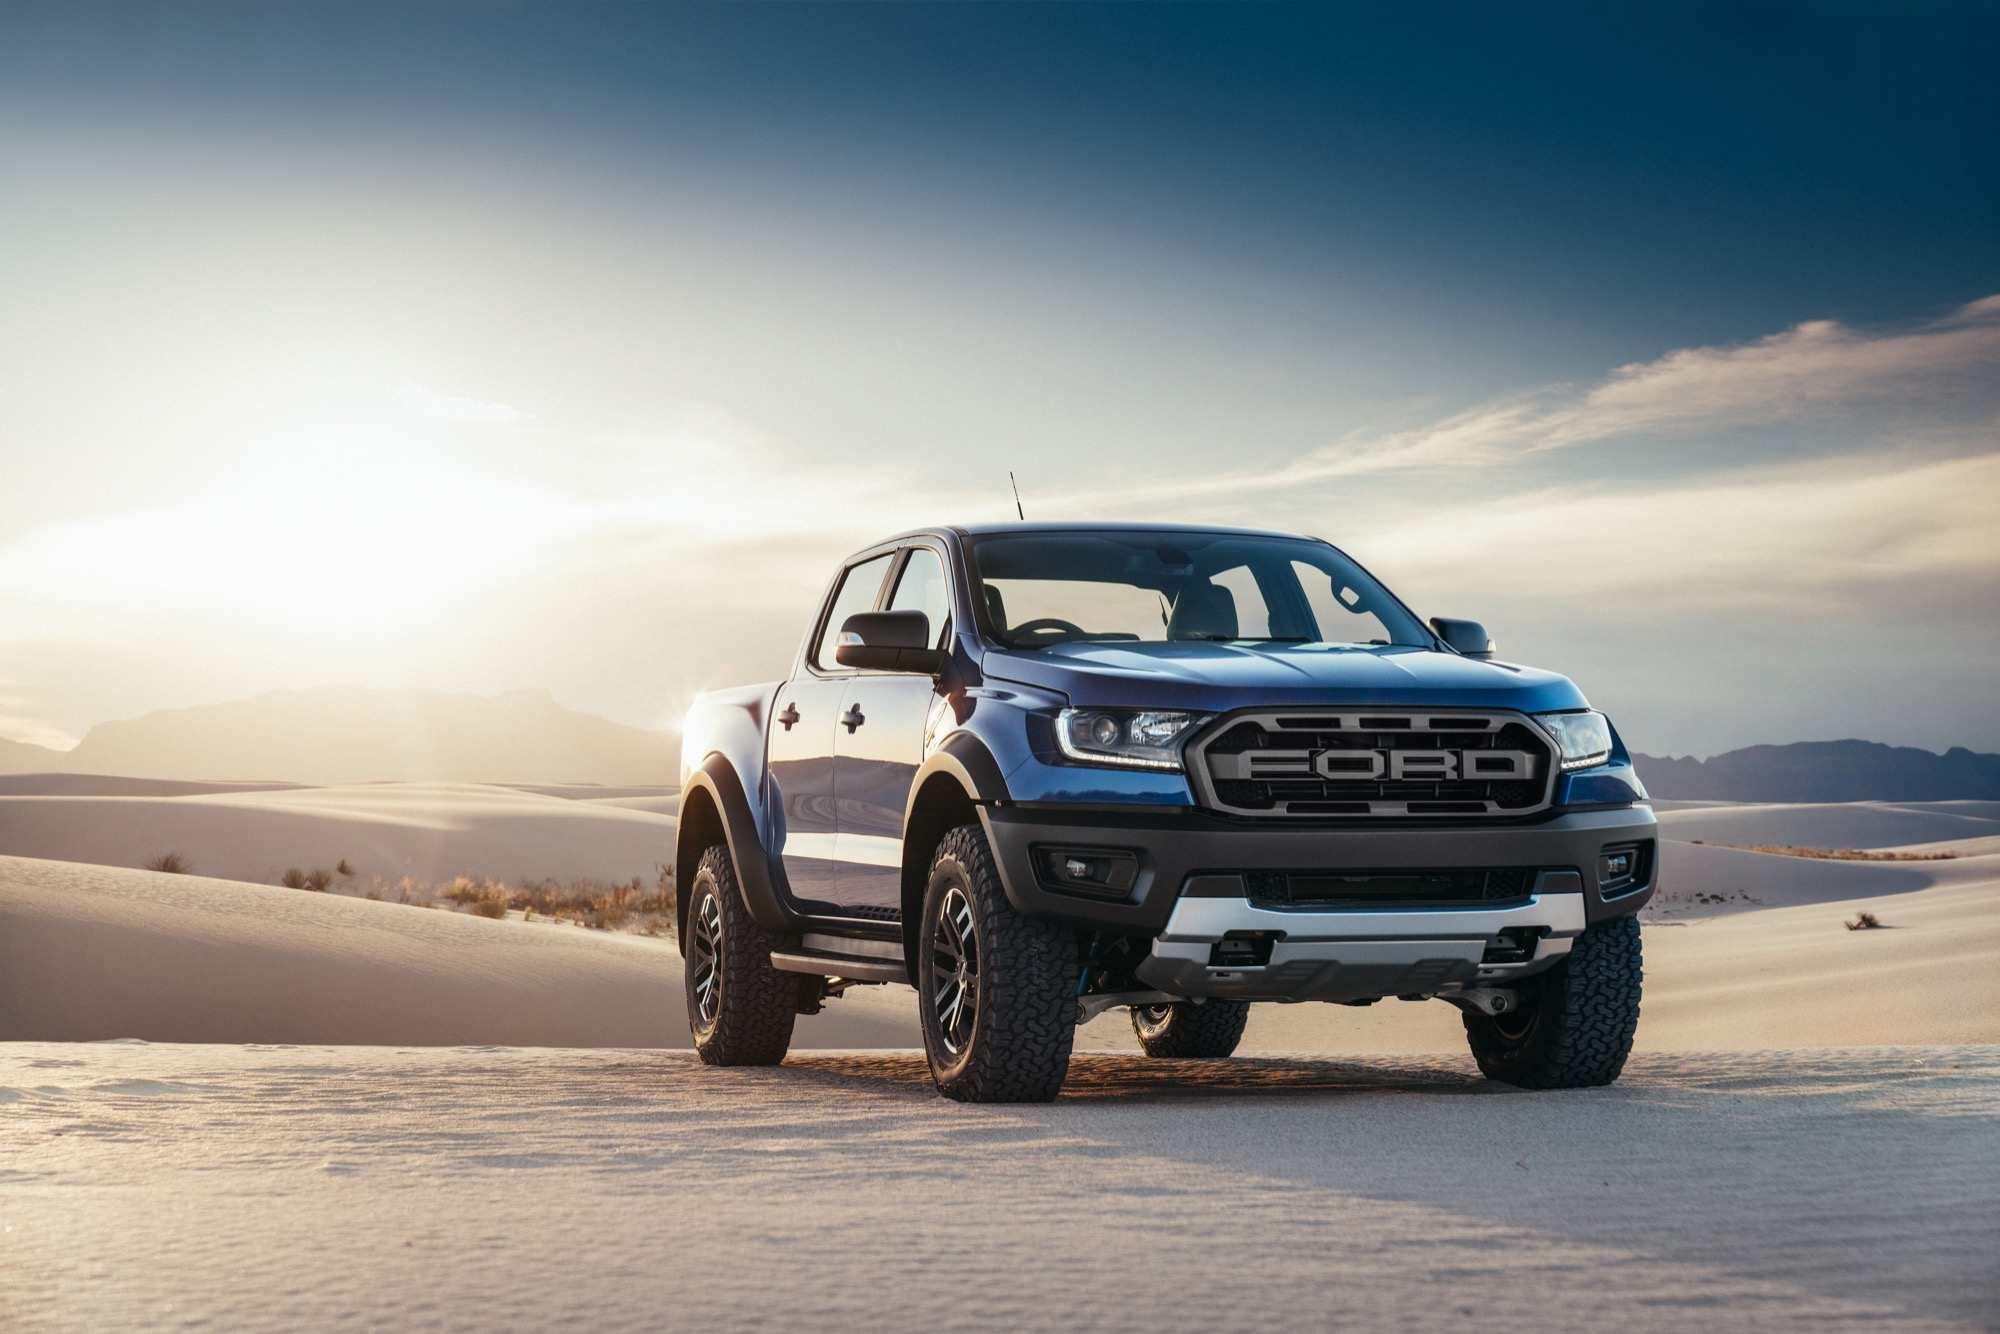 56 Concept of The New Ford 2019 Ranger Rumor Exterior by The New Ford 2019 Ranger Rumor